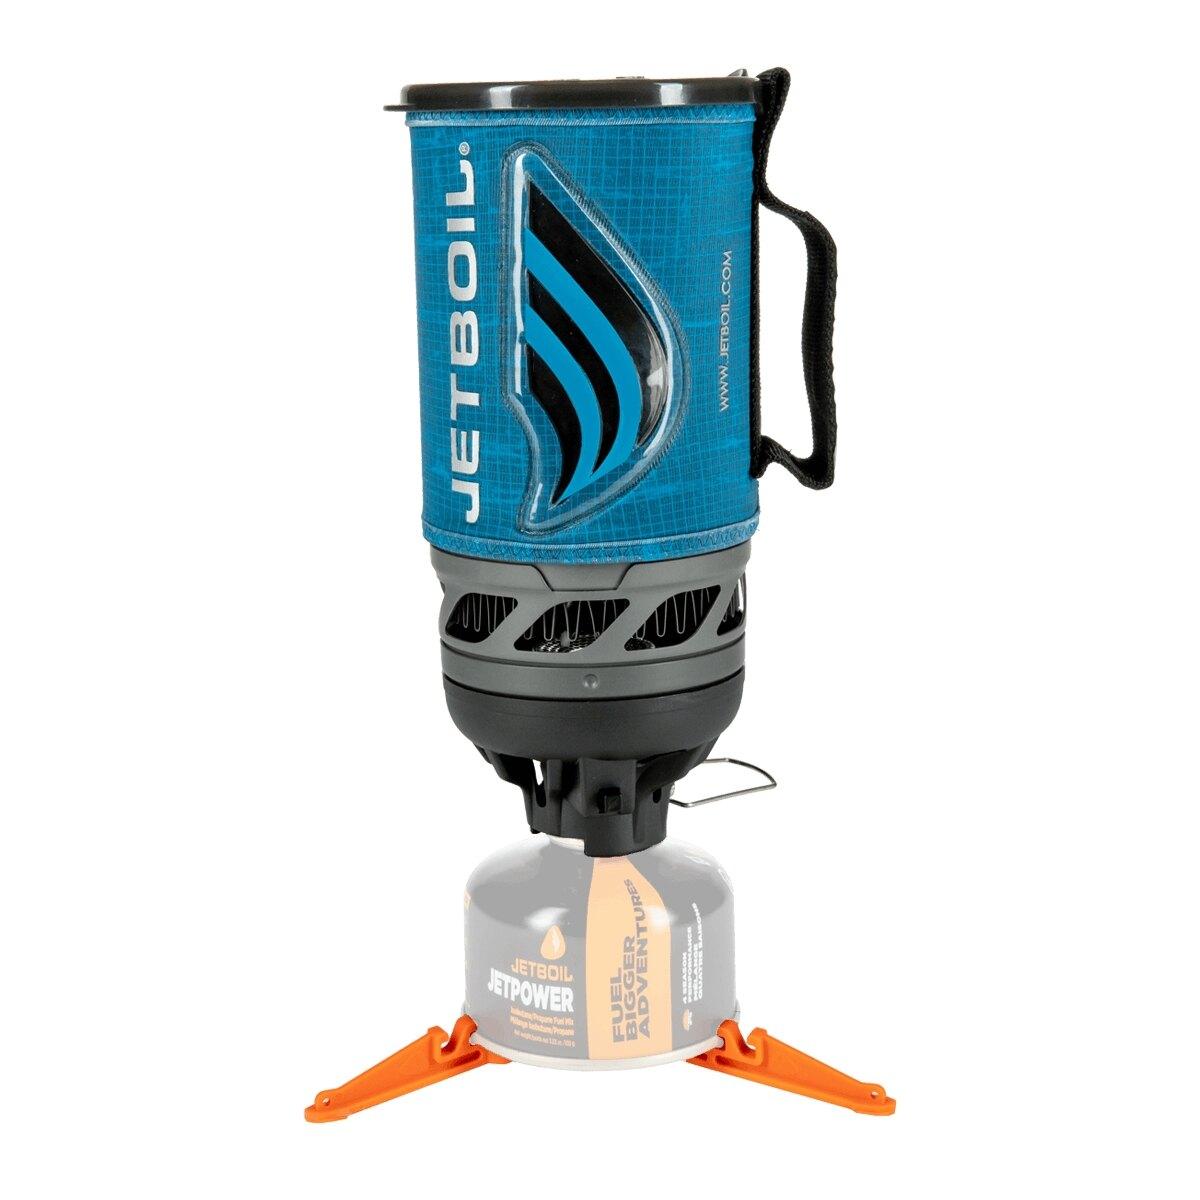 Plynový vařič Flash JETBOIL® - Matrix (Farba: Modrá, Varianta: Matrix)